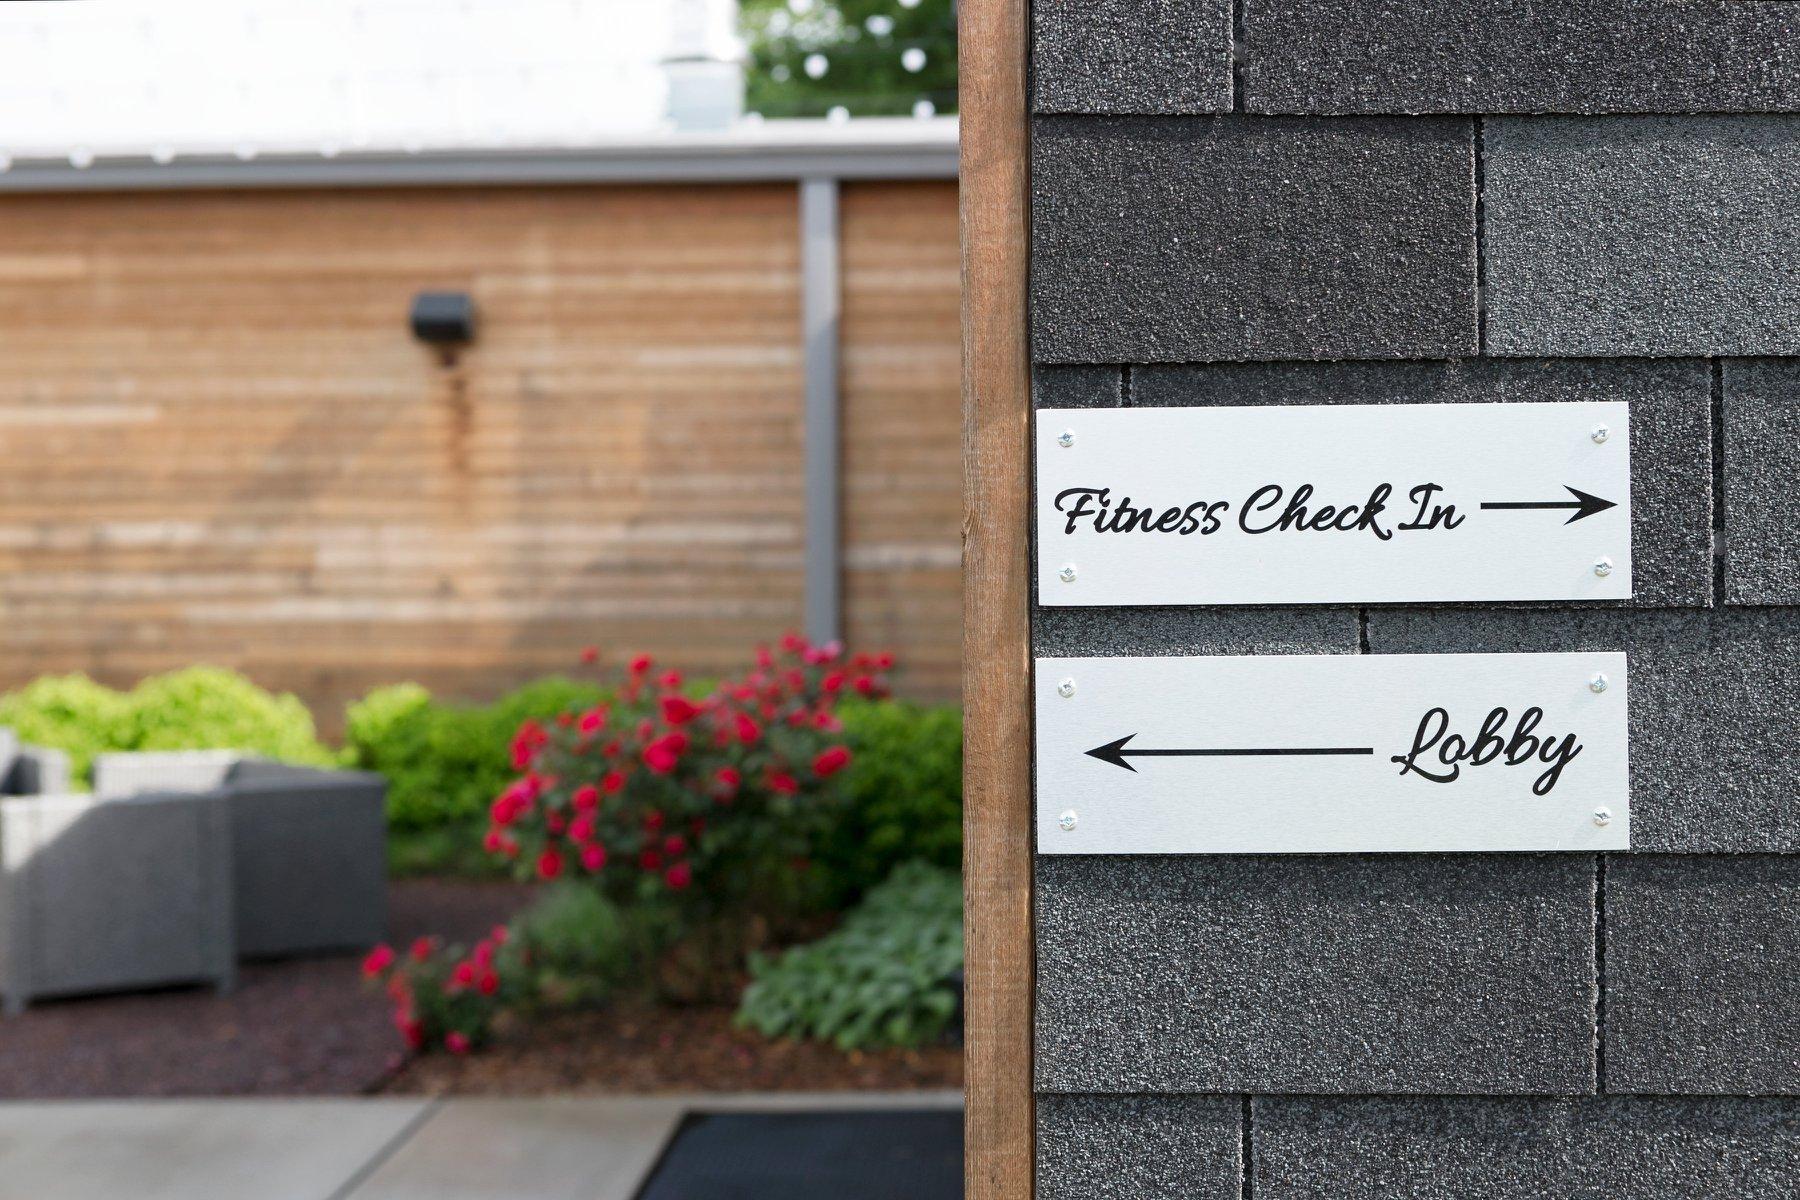 acacia spa springfield missouri courtyard sign lobby fitness